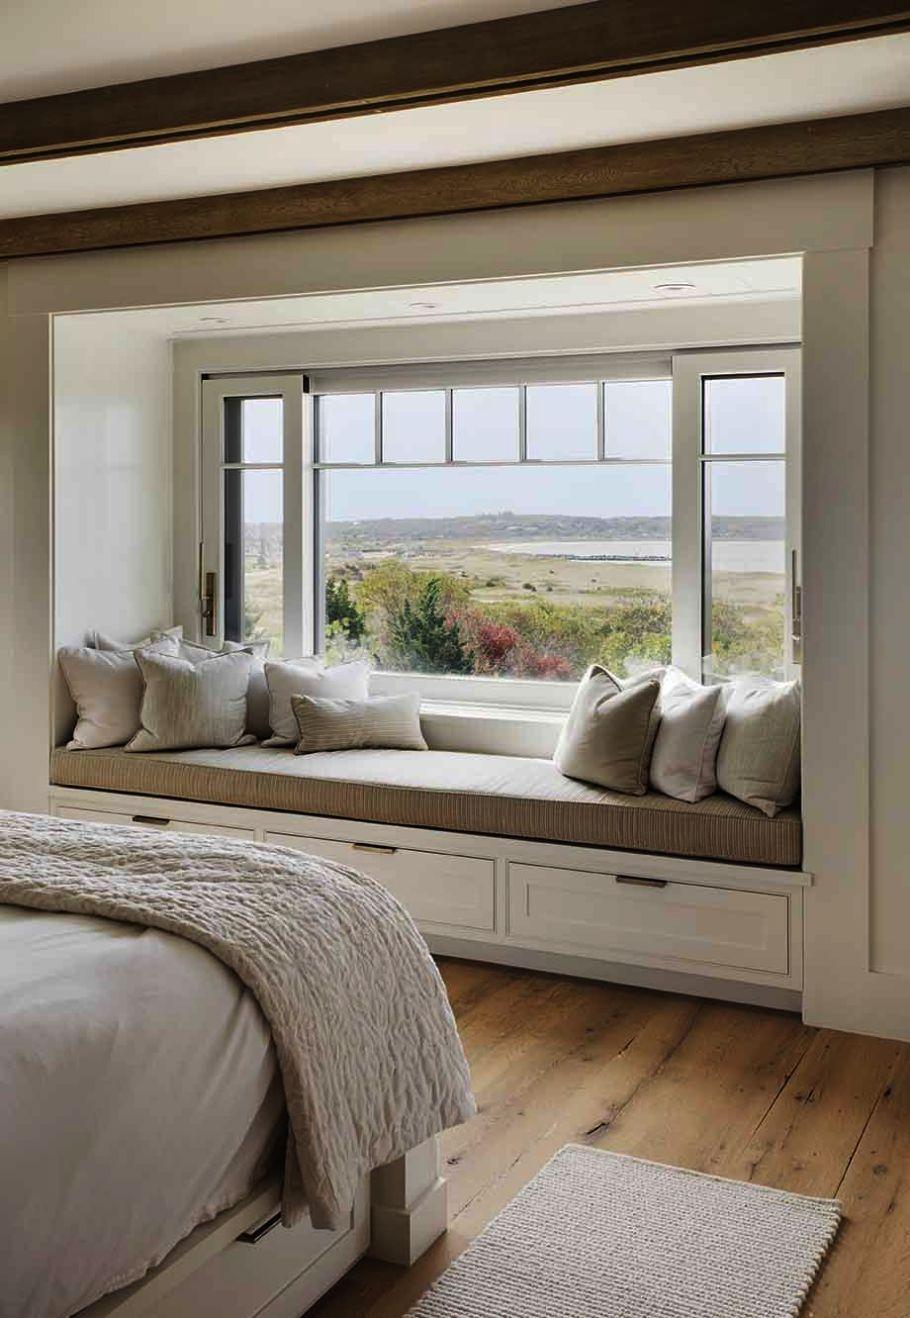 Coastal Floors And Interiors Beach House Interior Design Uk Home Decor Bedroom Bedroom Design Home Bedroom Bedroom window ideas uk